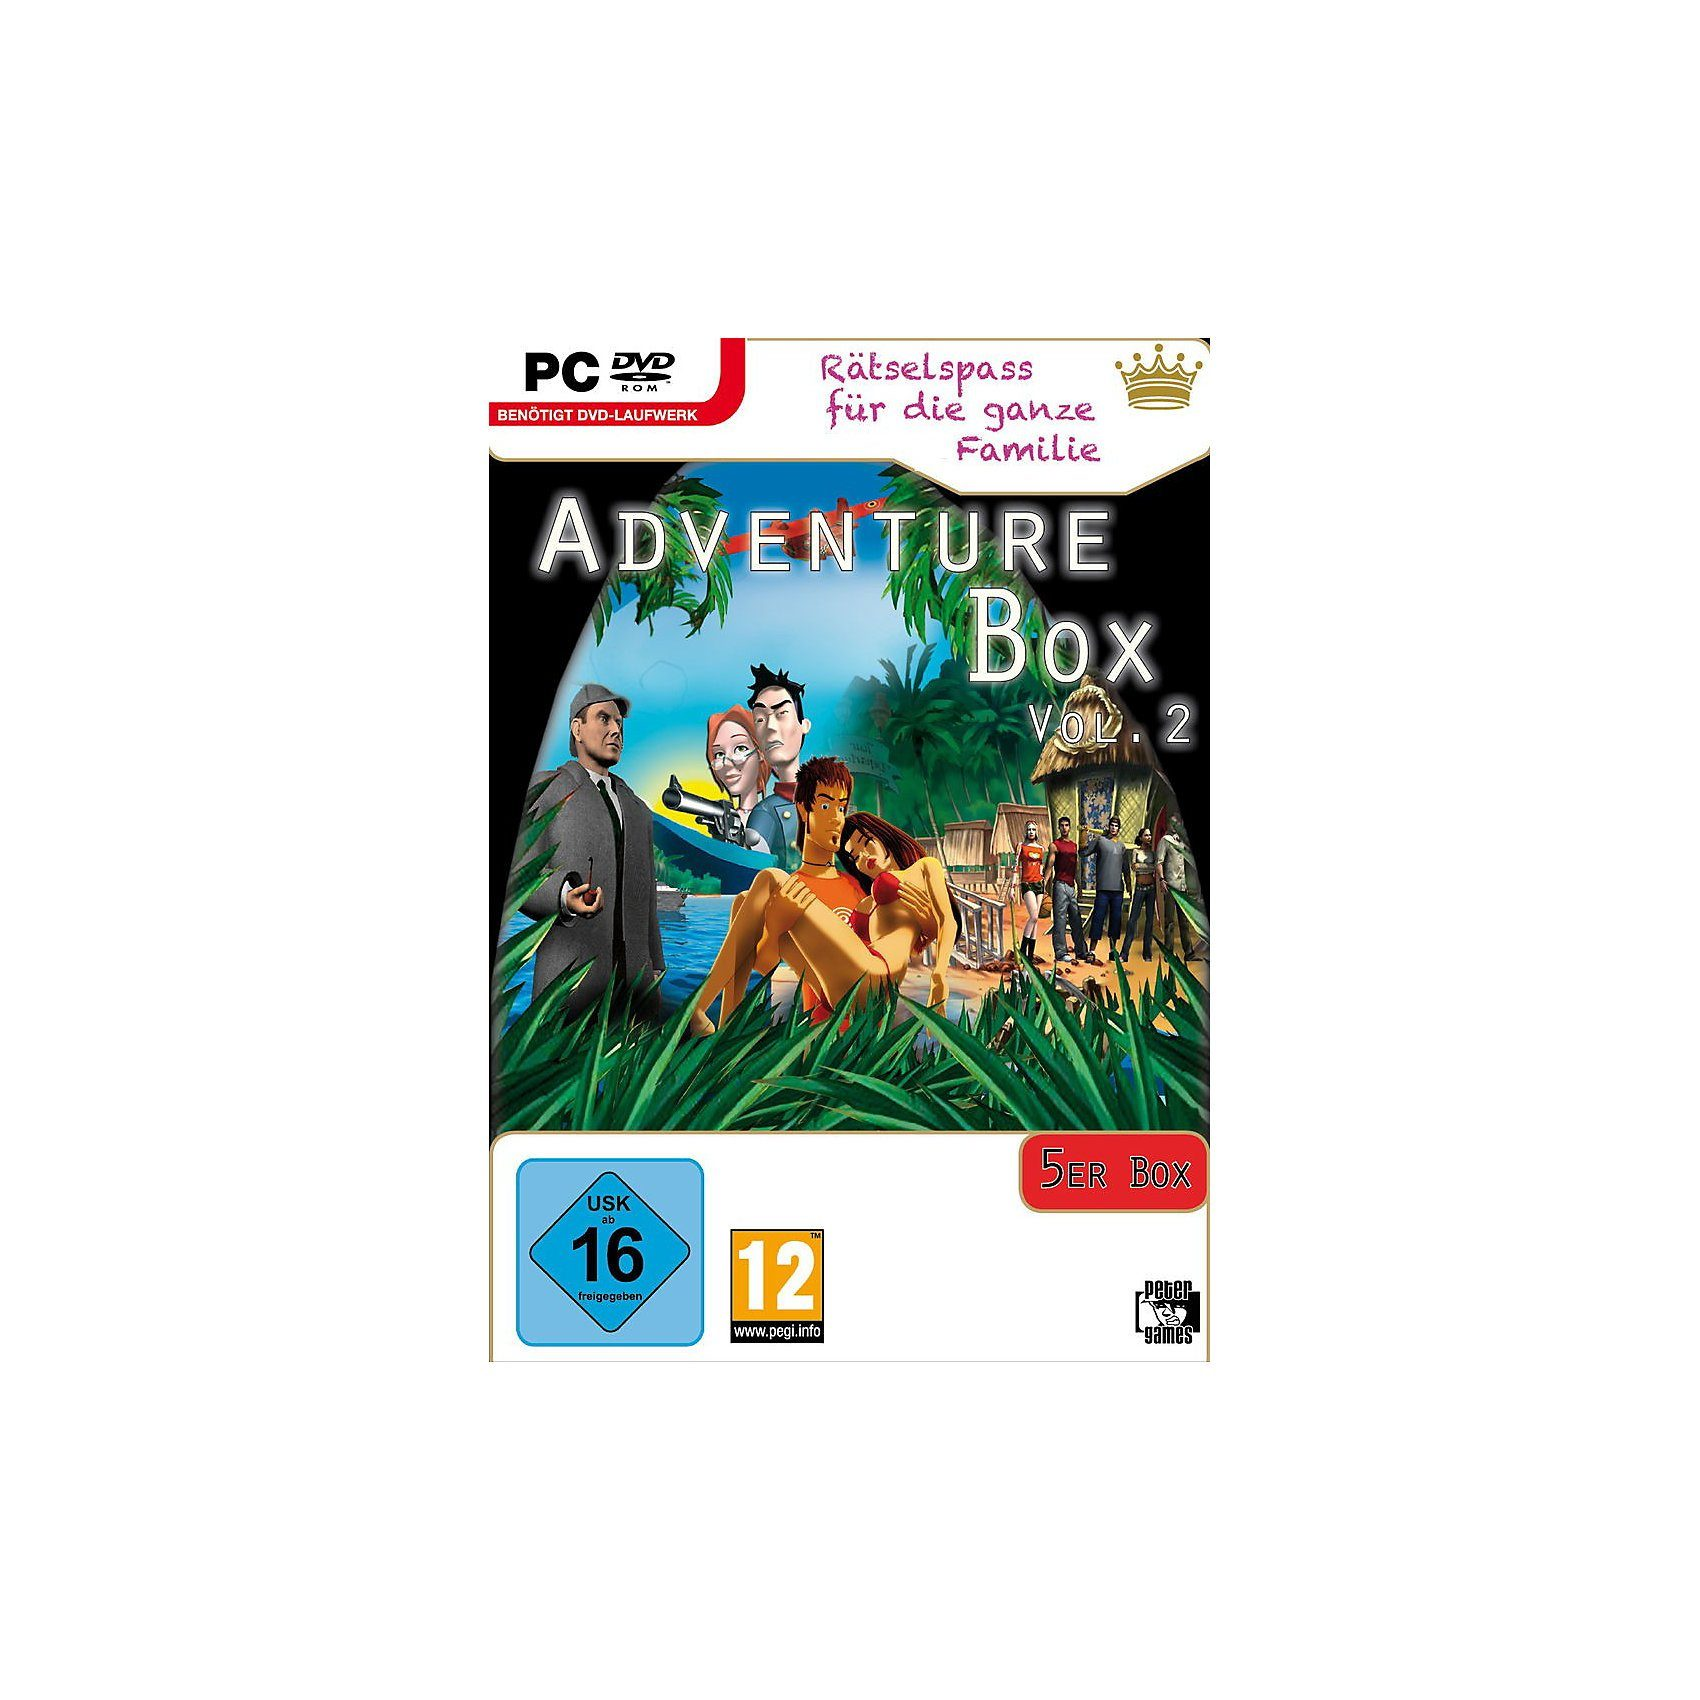 PC Adventure Box Vol. 2 (5er)